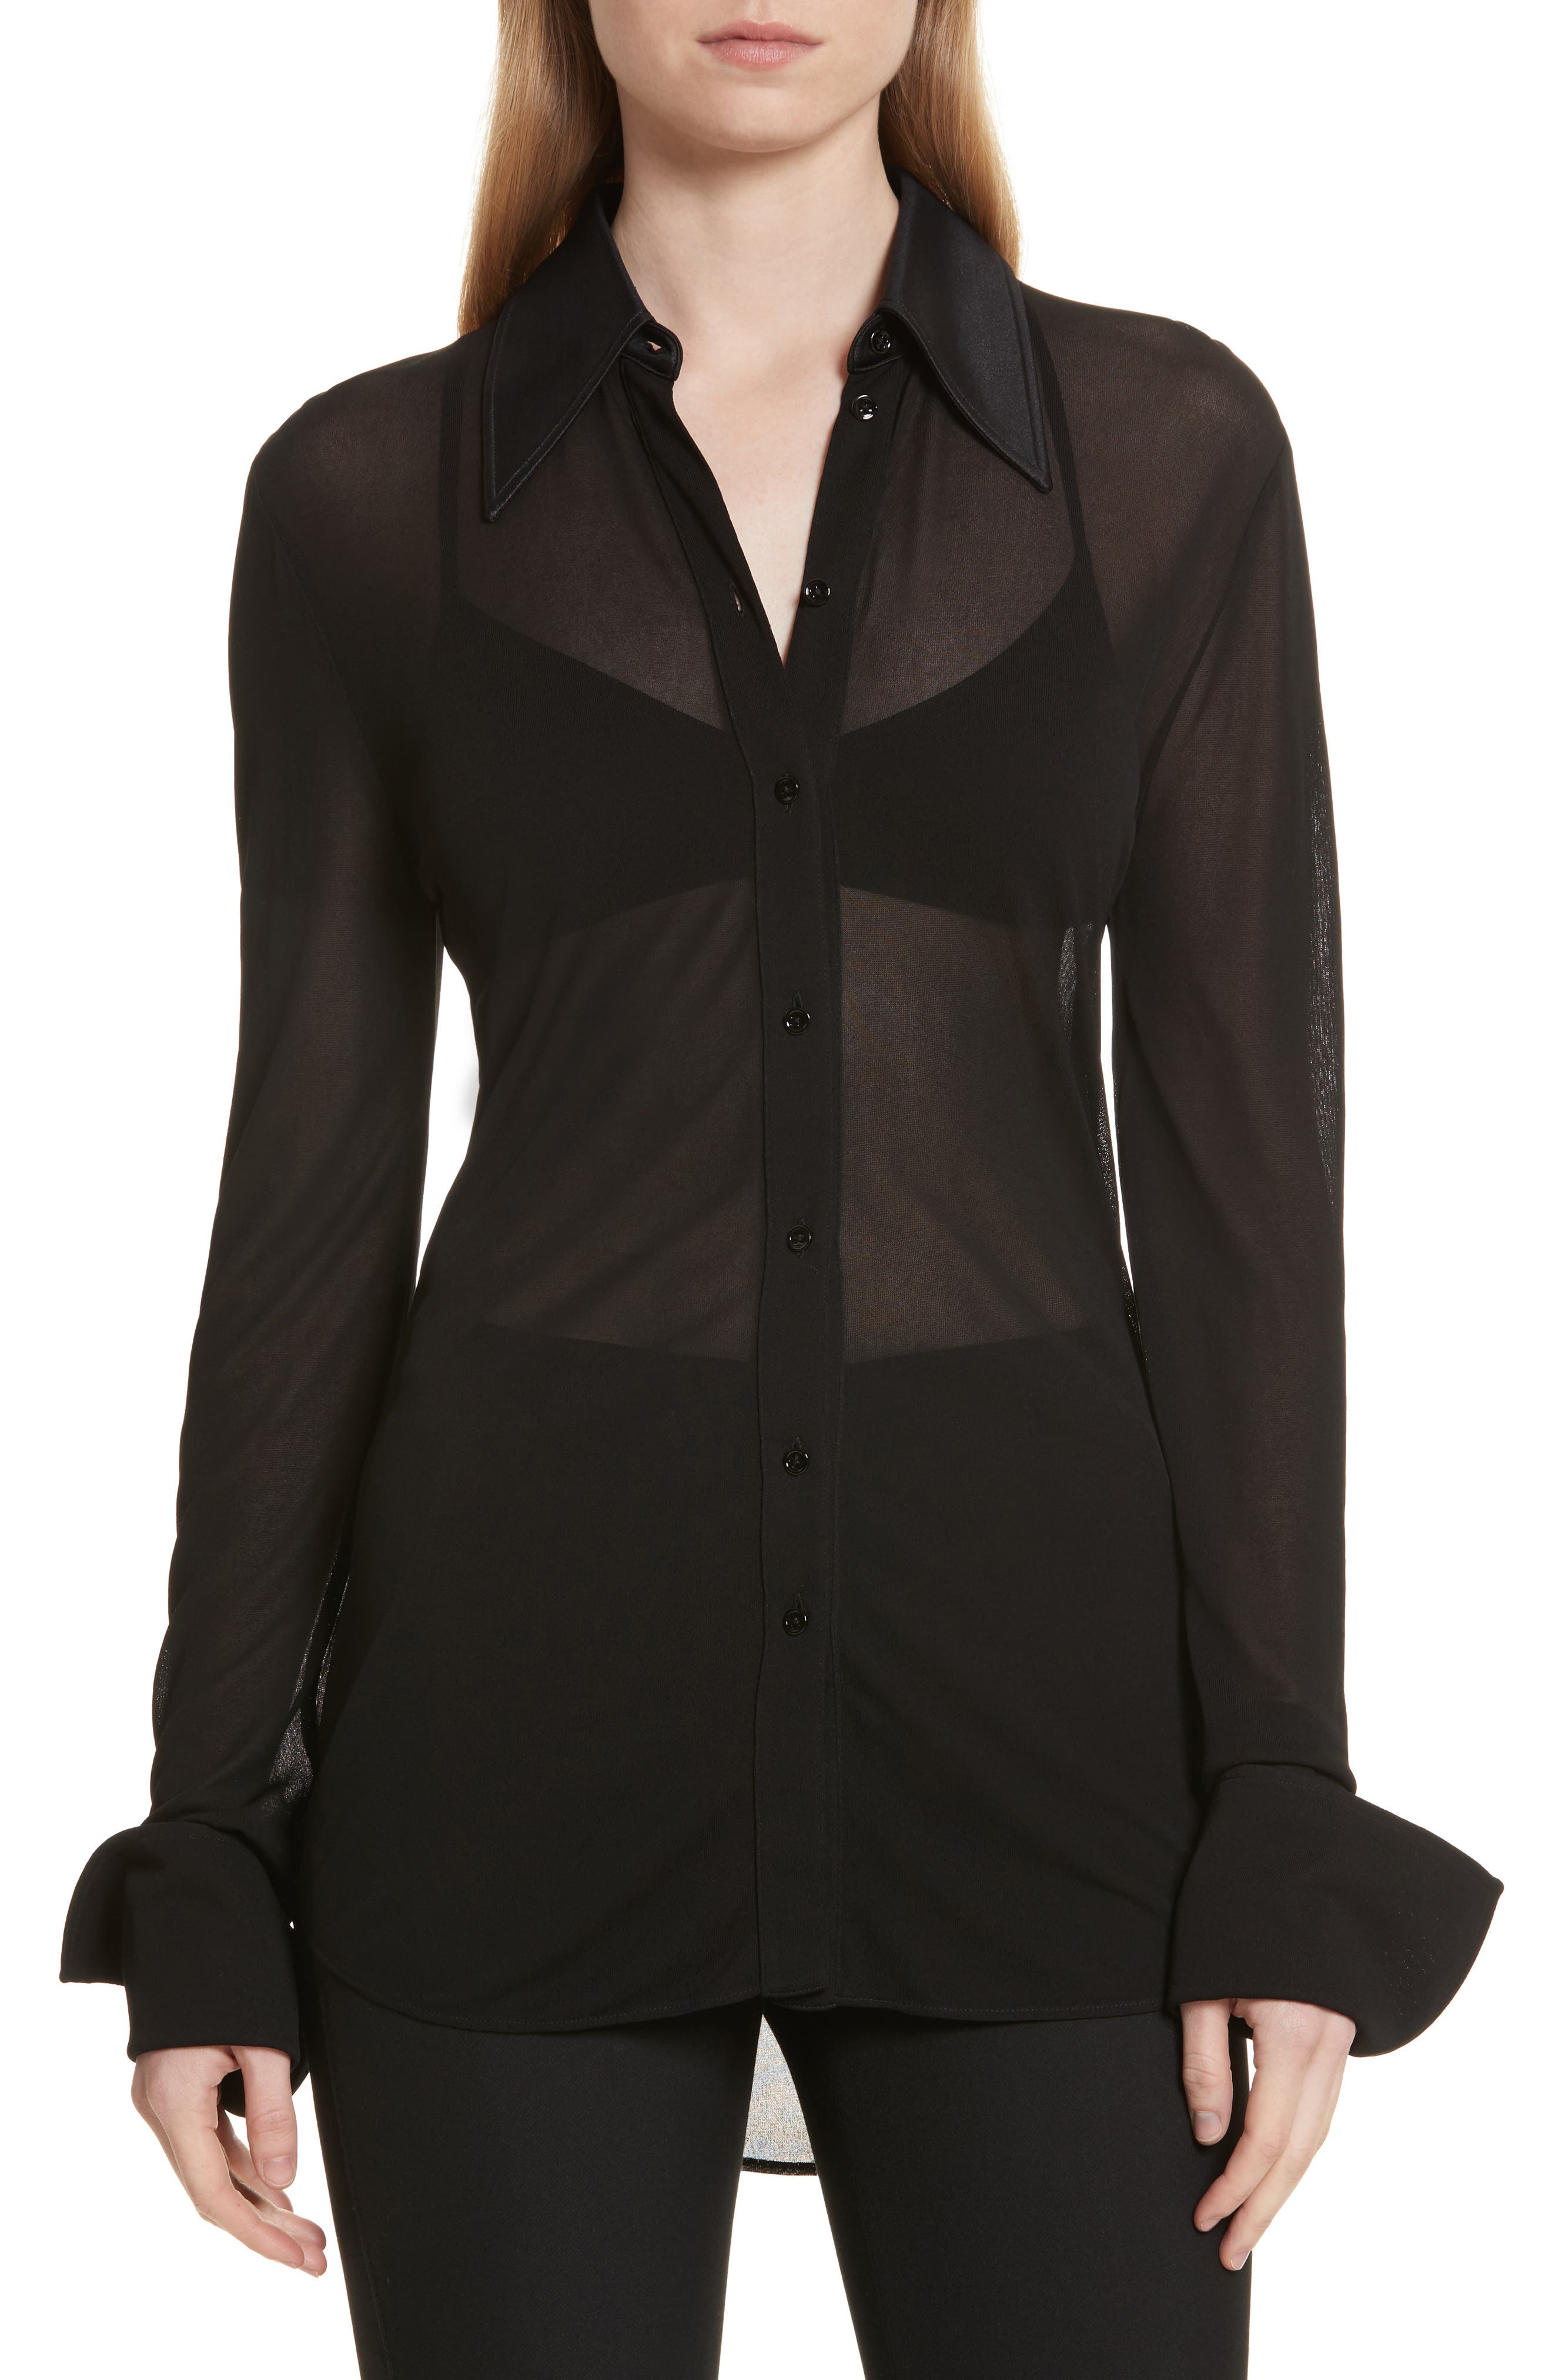 Slater Sheer Crepe Net Shirt,                         Main,                         color, Black